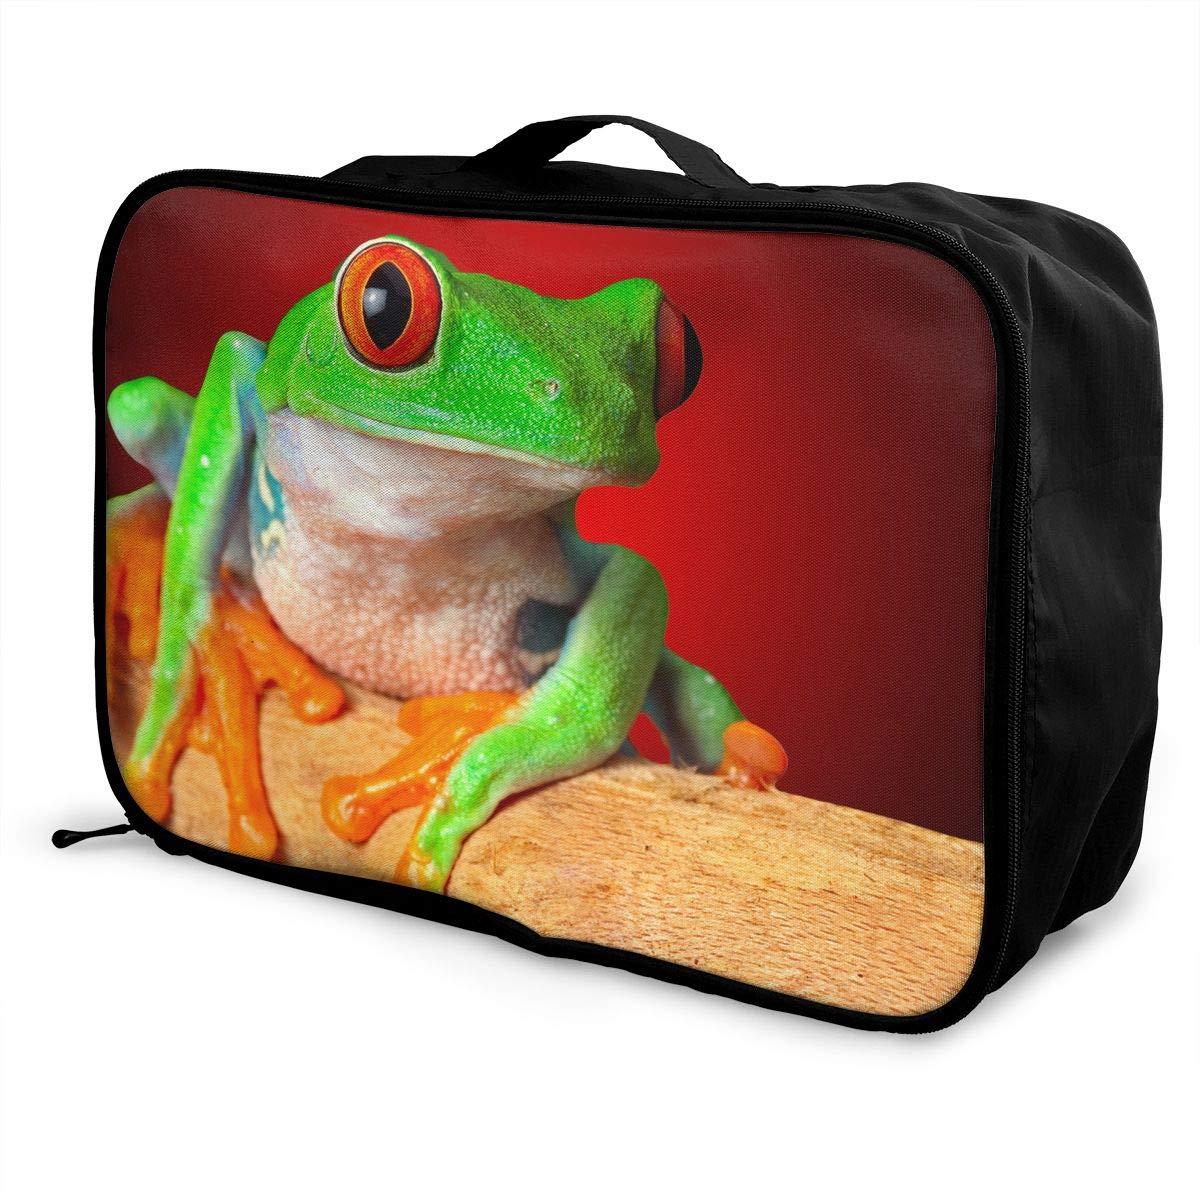 Travel Luggage Duffle Bag Lightweight Portable Handbag Green Frog Large Capacity Waterproof Foldable Storage Tote